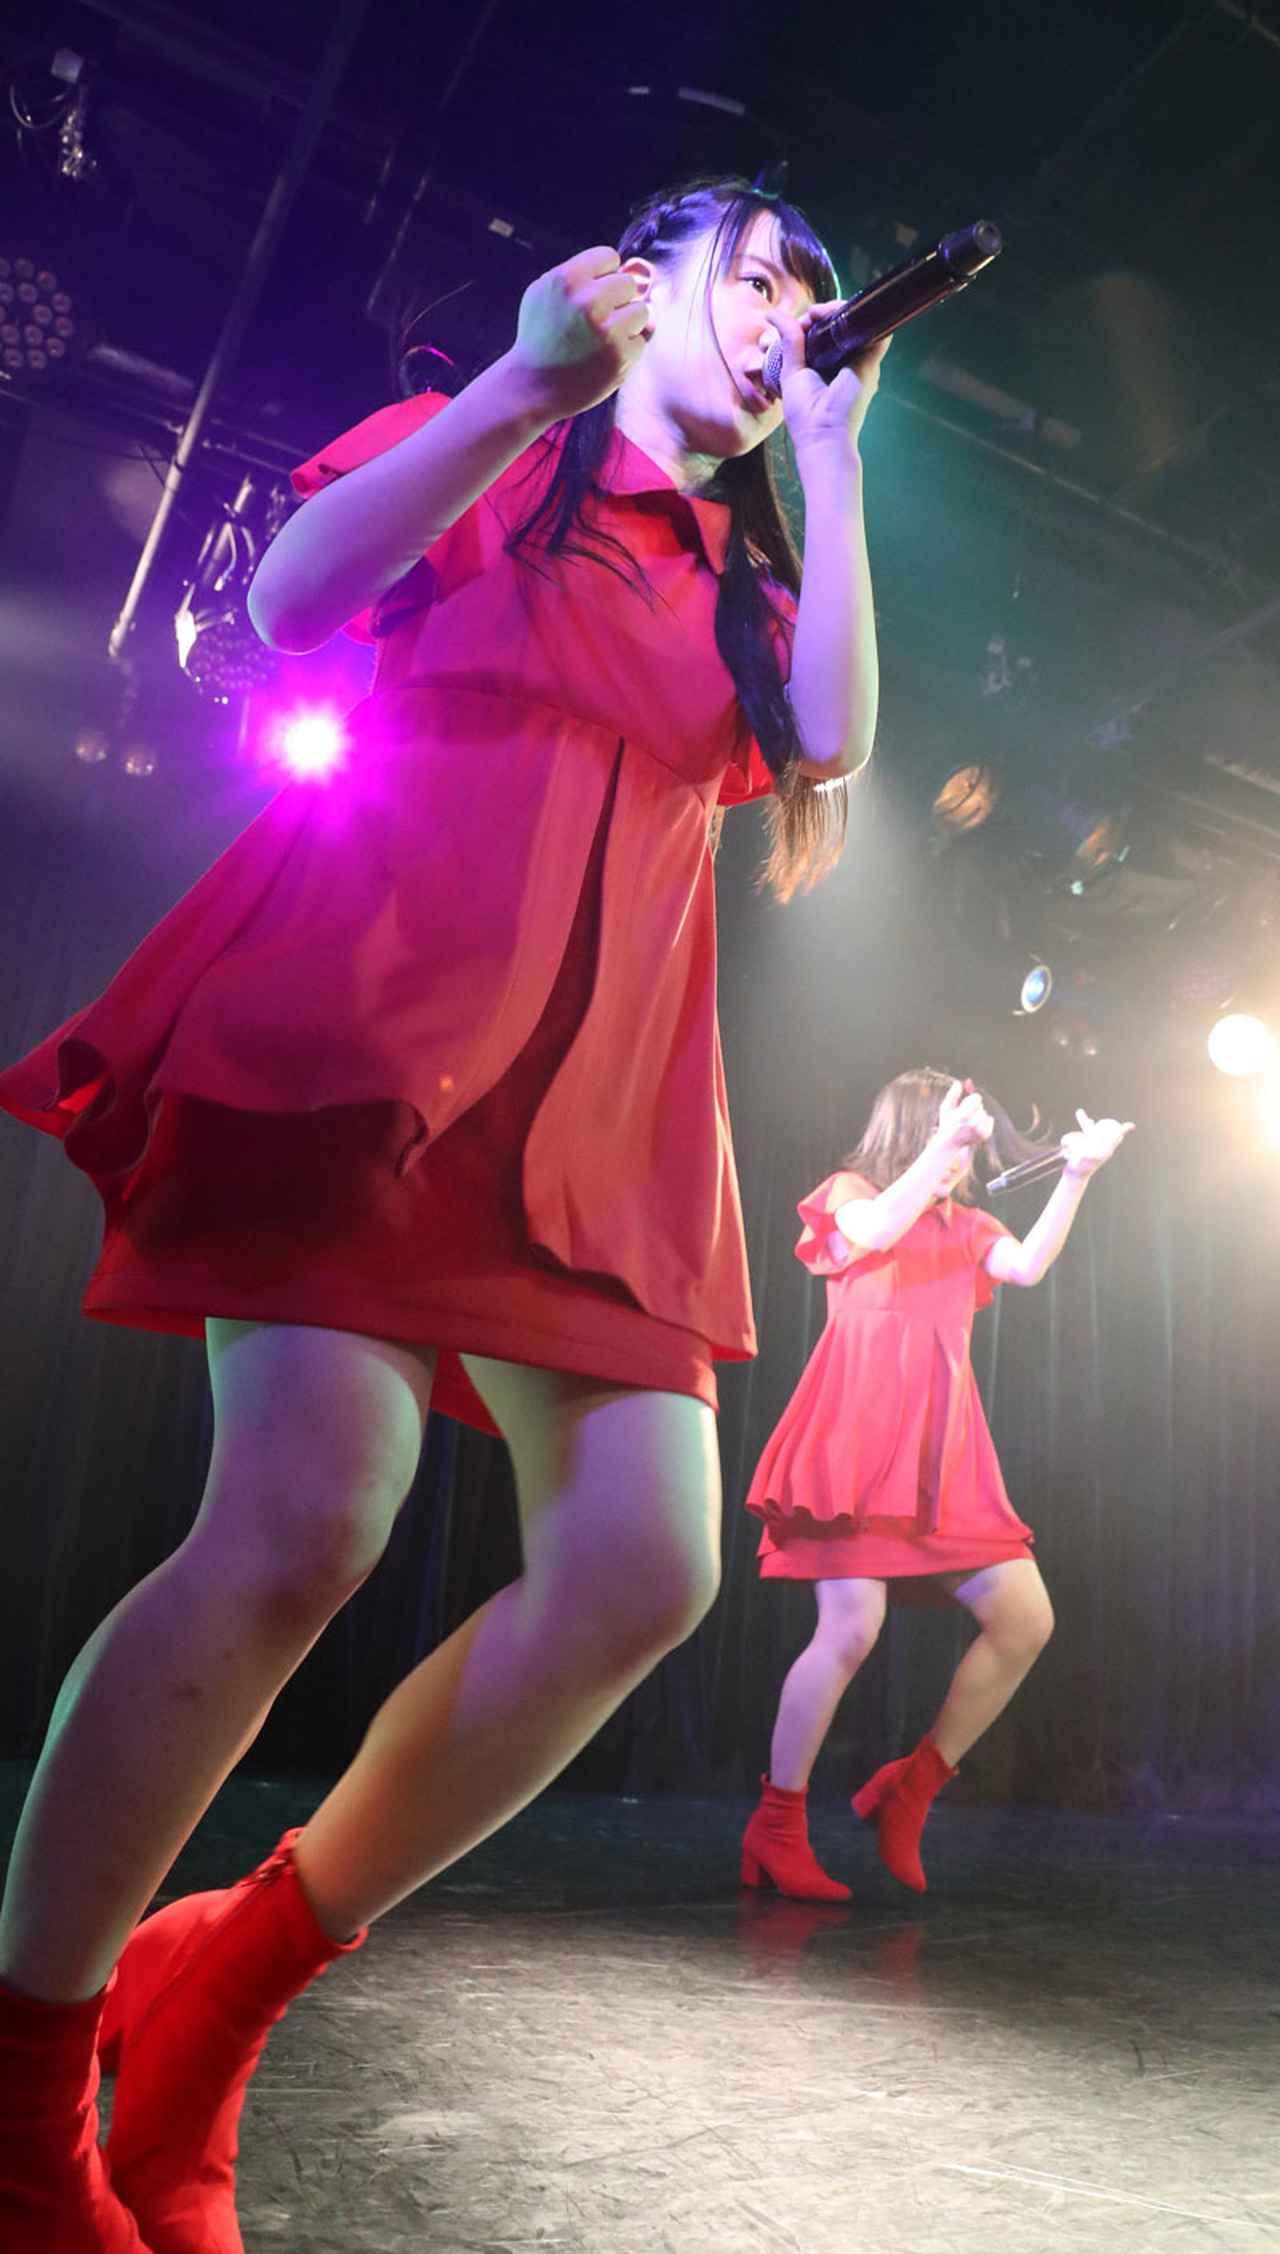 Images : 29番目の画像 - 「九州女子翼/定期公演第十四片inTOKYOは、いままでの成長を一気に開花させた極上のステージを構築」のアルバム - Stereo Sound ONLINE